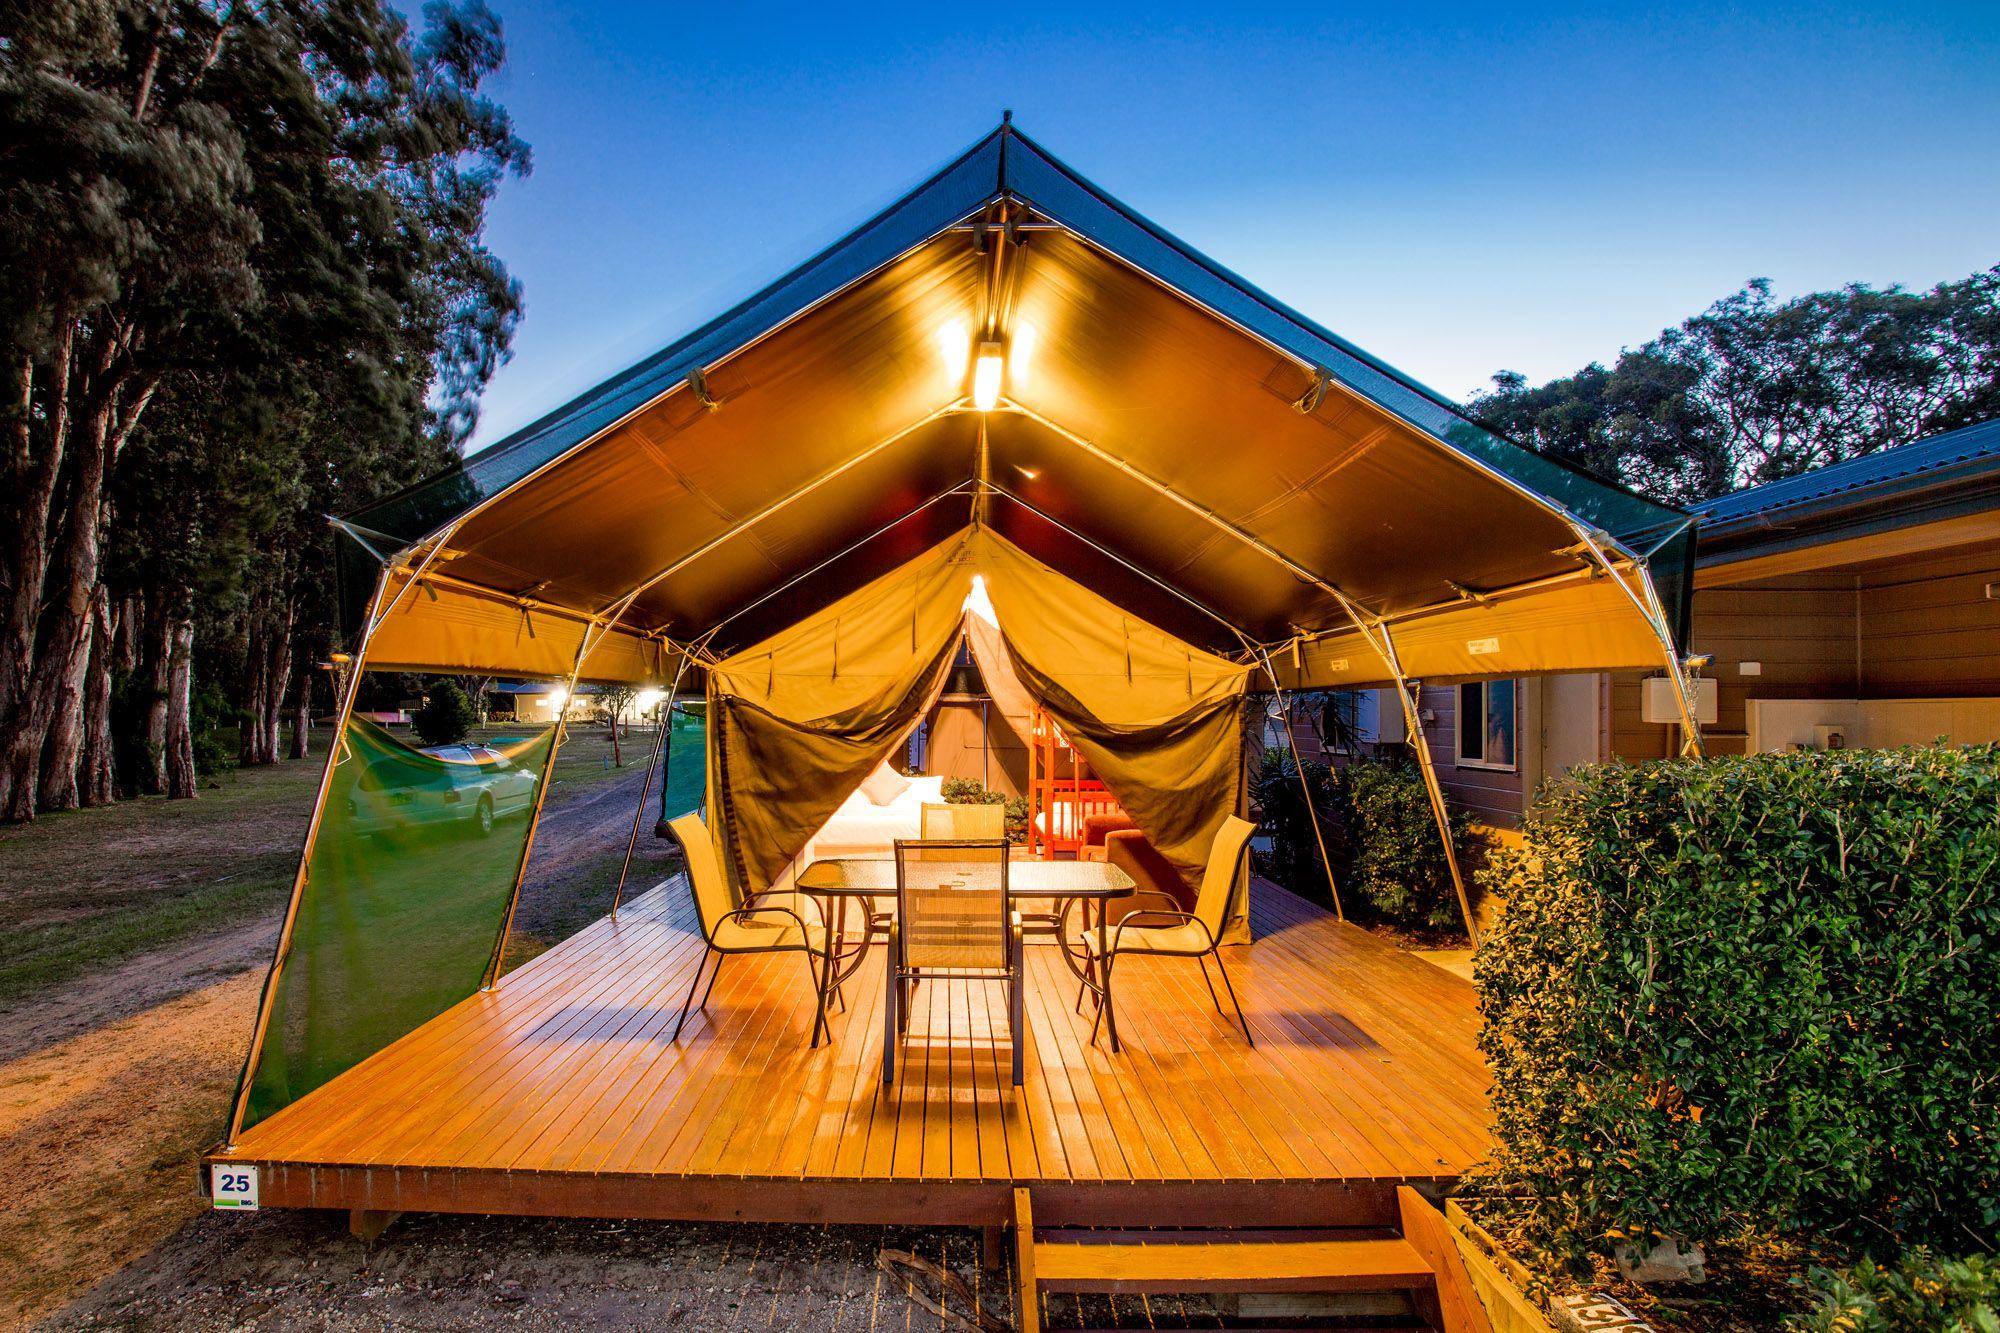 Luxury cabin accommodation - safari tents at Discovery Parks - Harrington in Harrington NSW. & Luxury cabin accommodation - safari tents at Discovery Parks ...